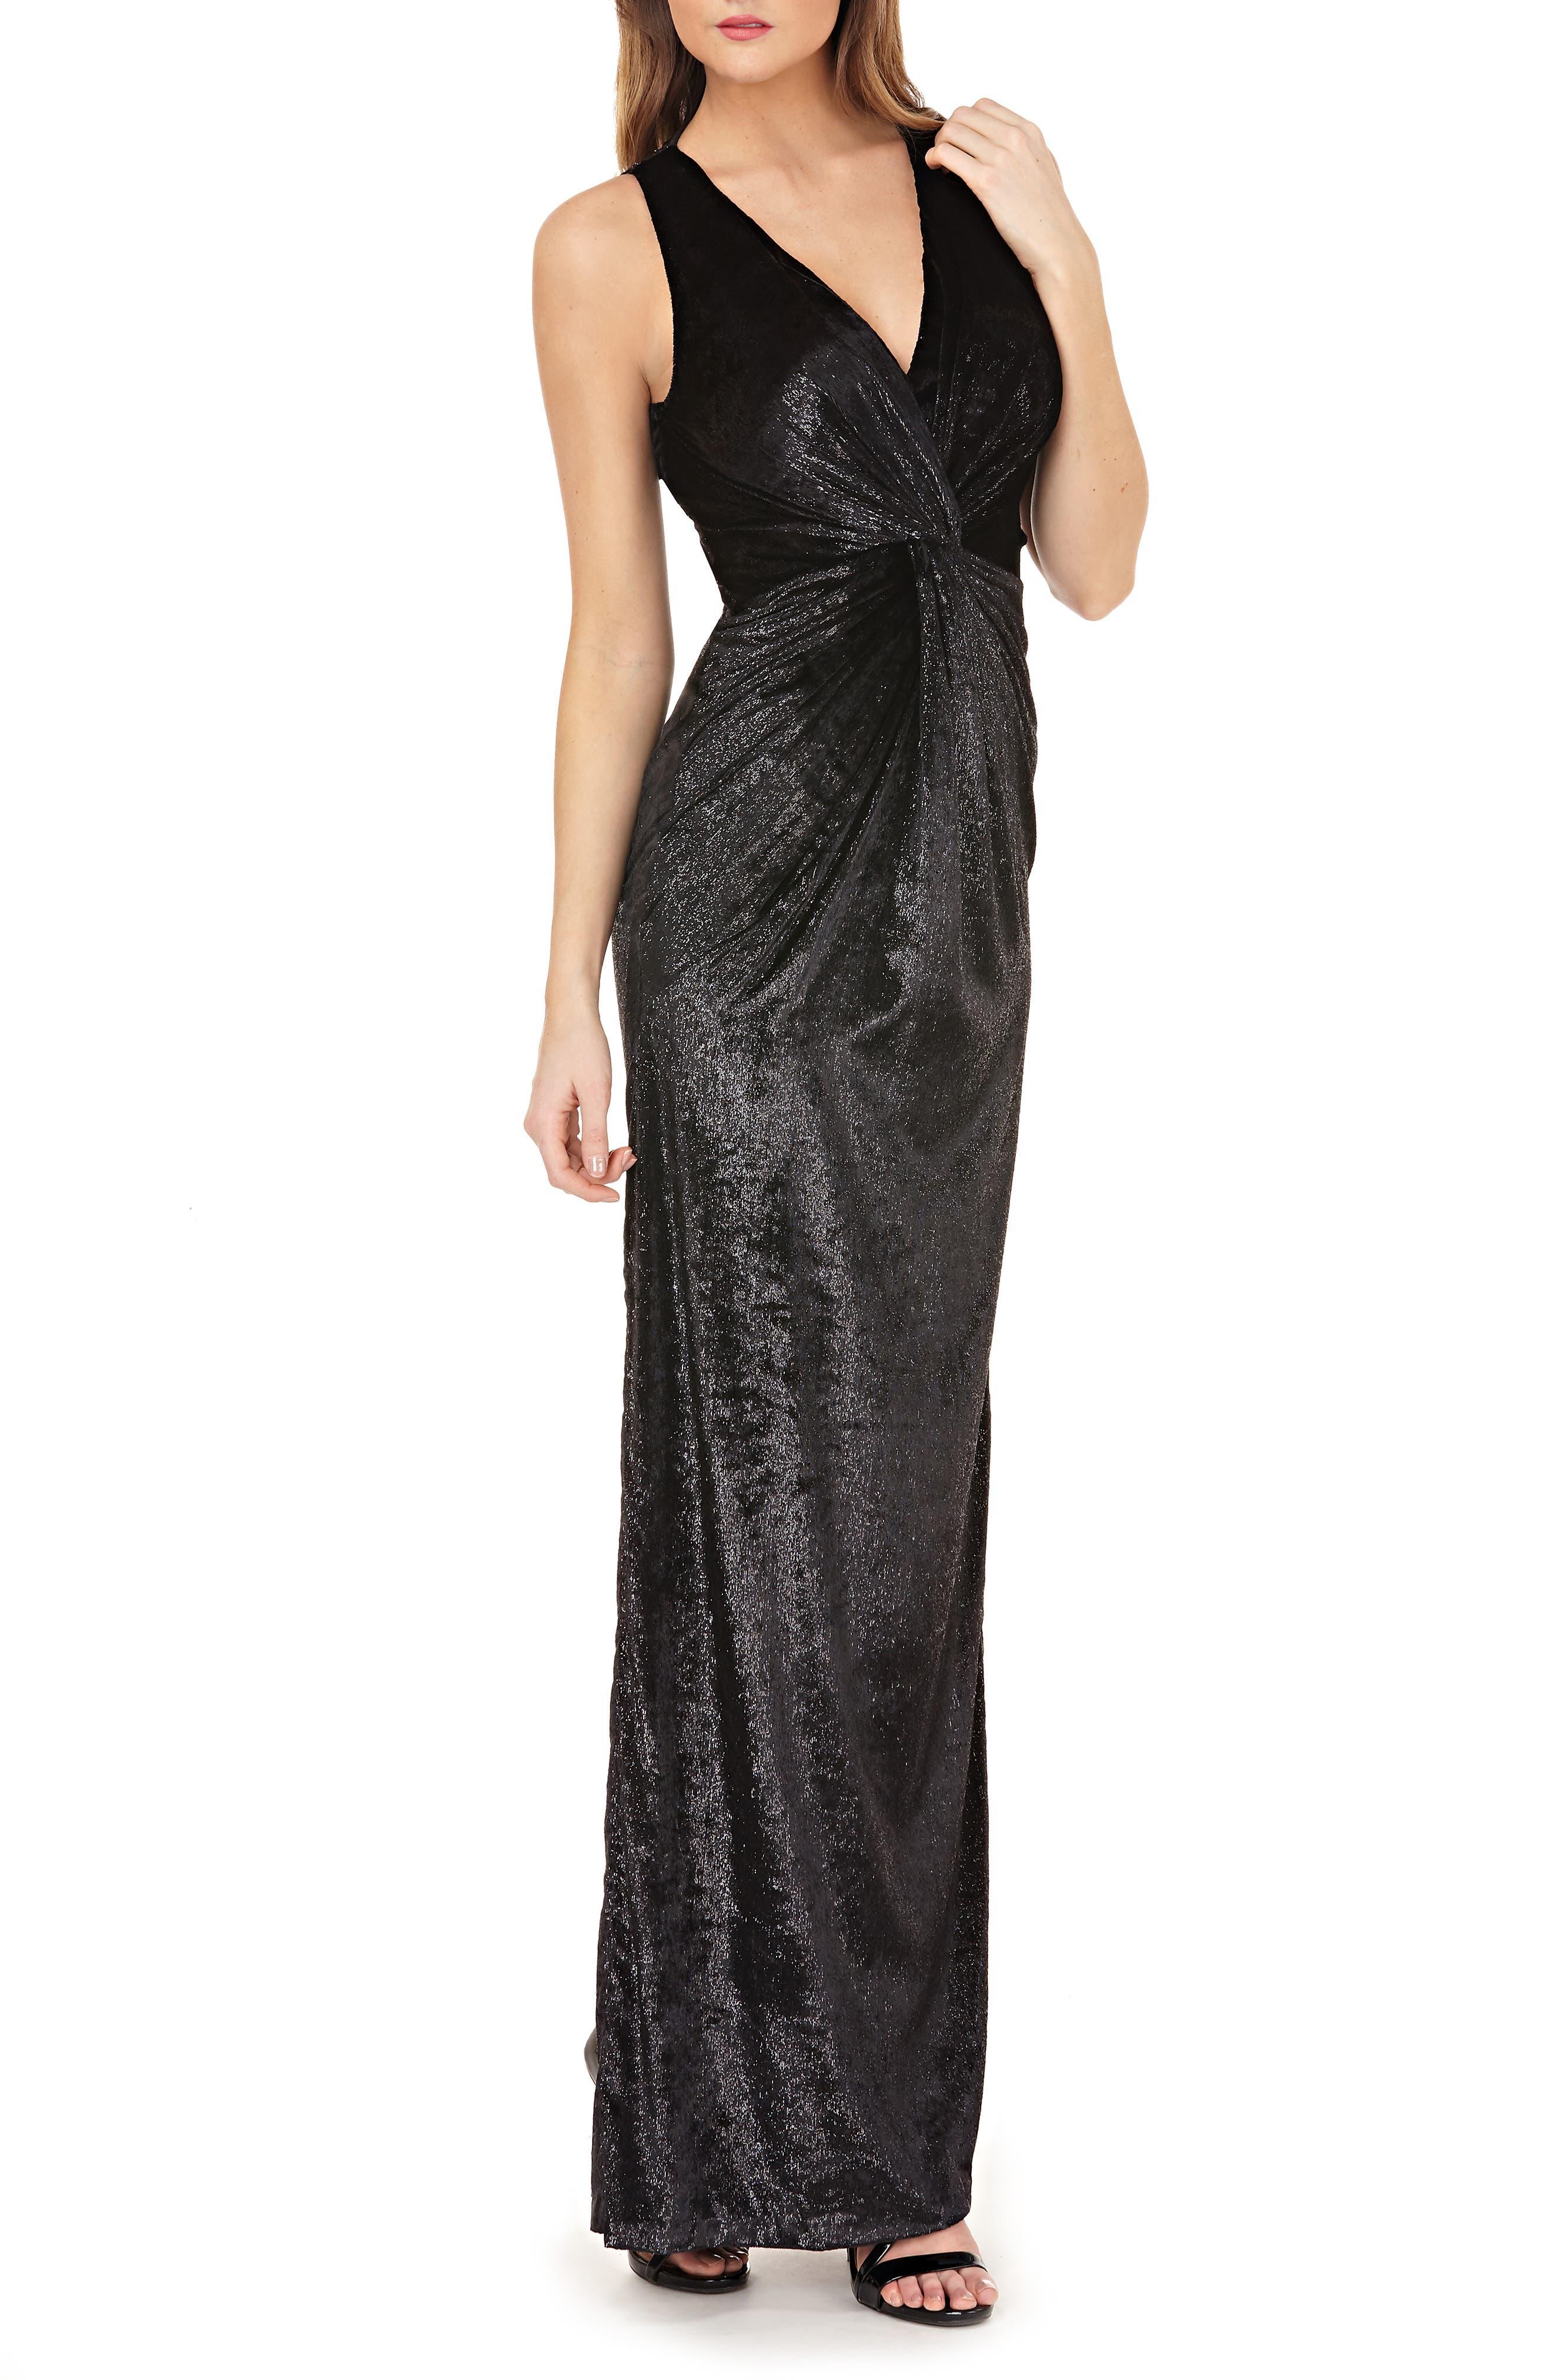 70s Prom, Formal, Evening, Party Dresses Womens Js Collections Velvet Twist Gown $172.80 AT vintagedancer.com